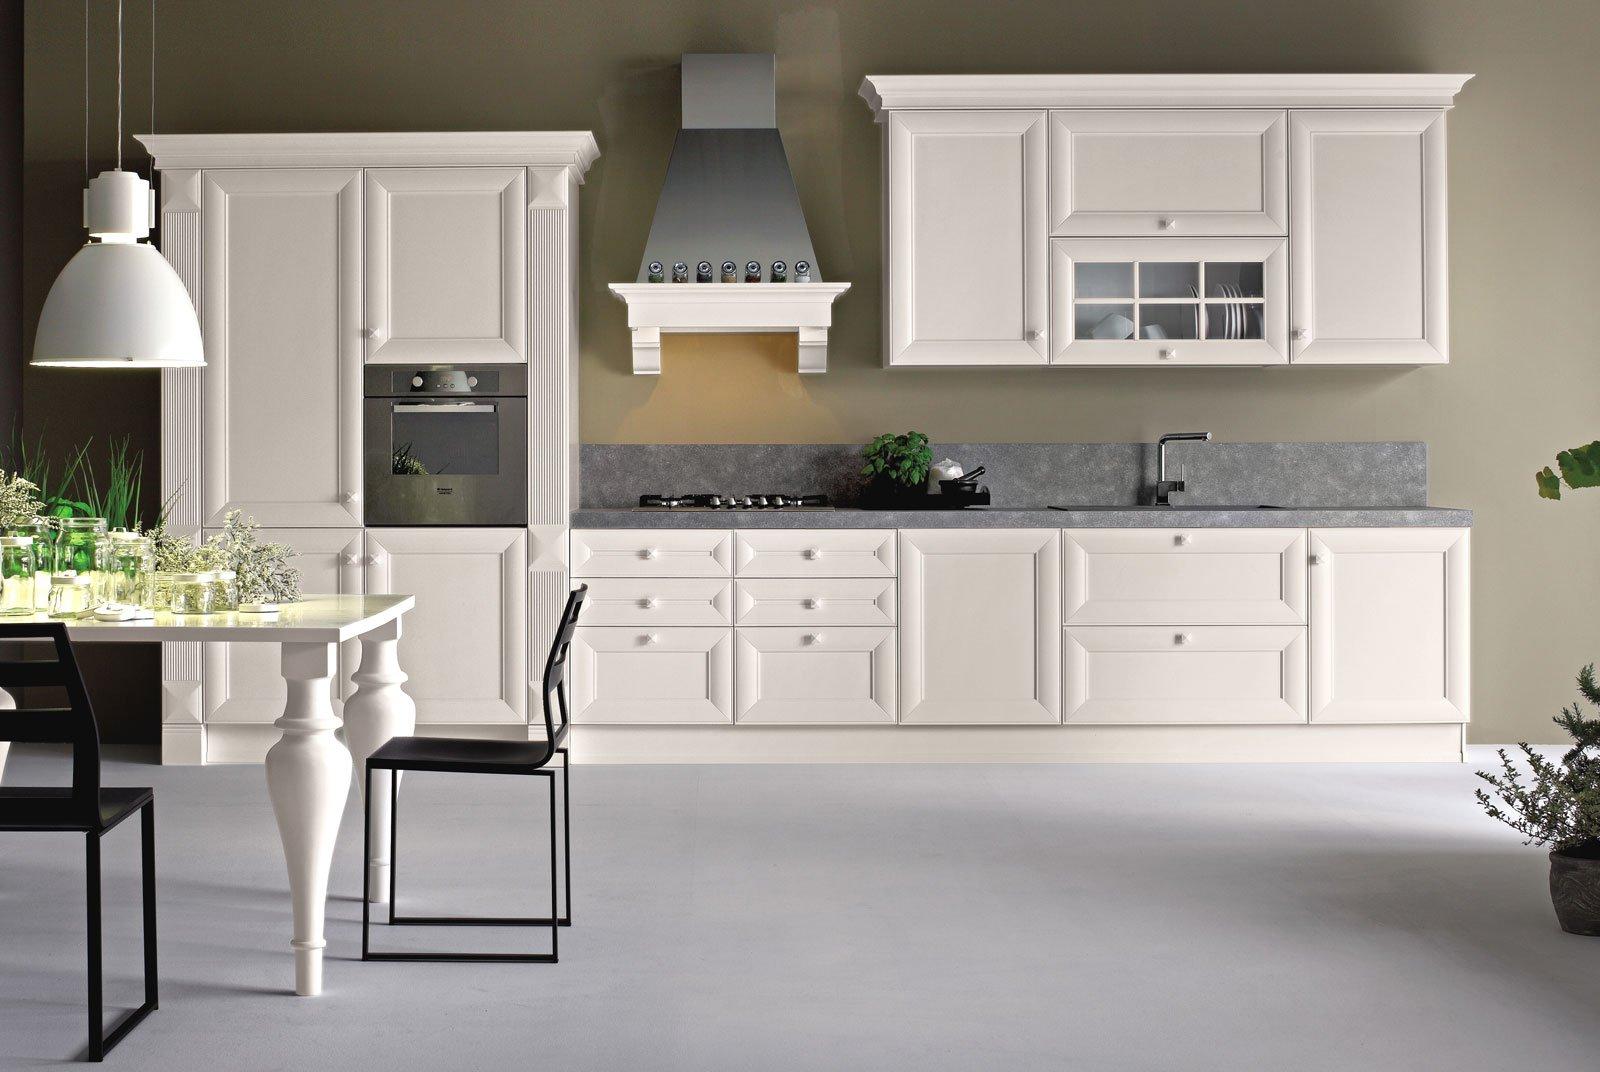 Cucina bianca il fascino eterno della luminosit cose for Cucina classica bianca